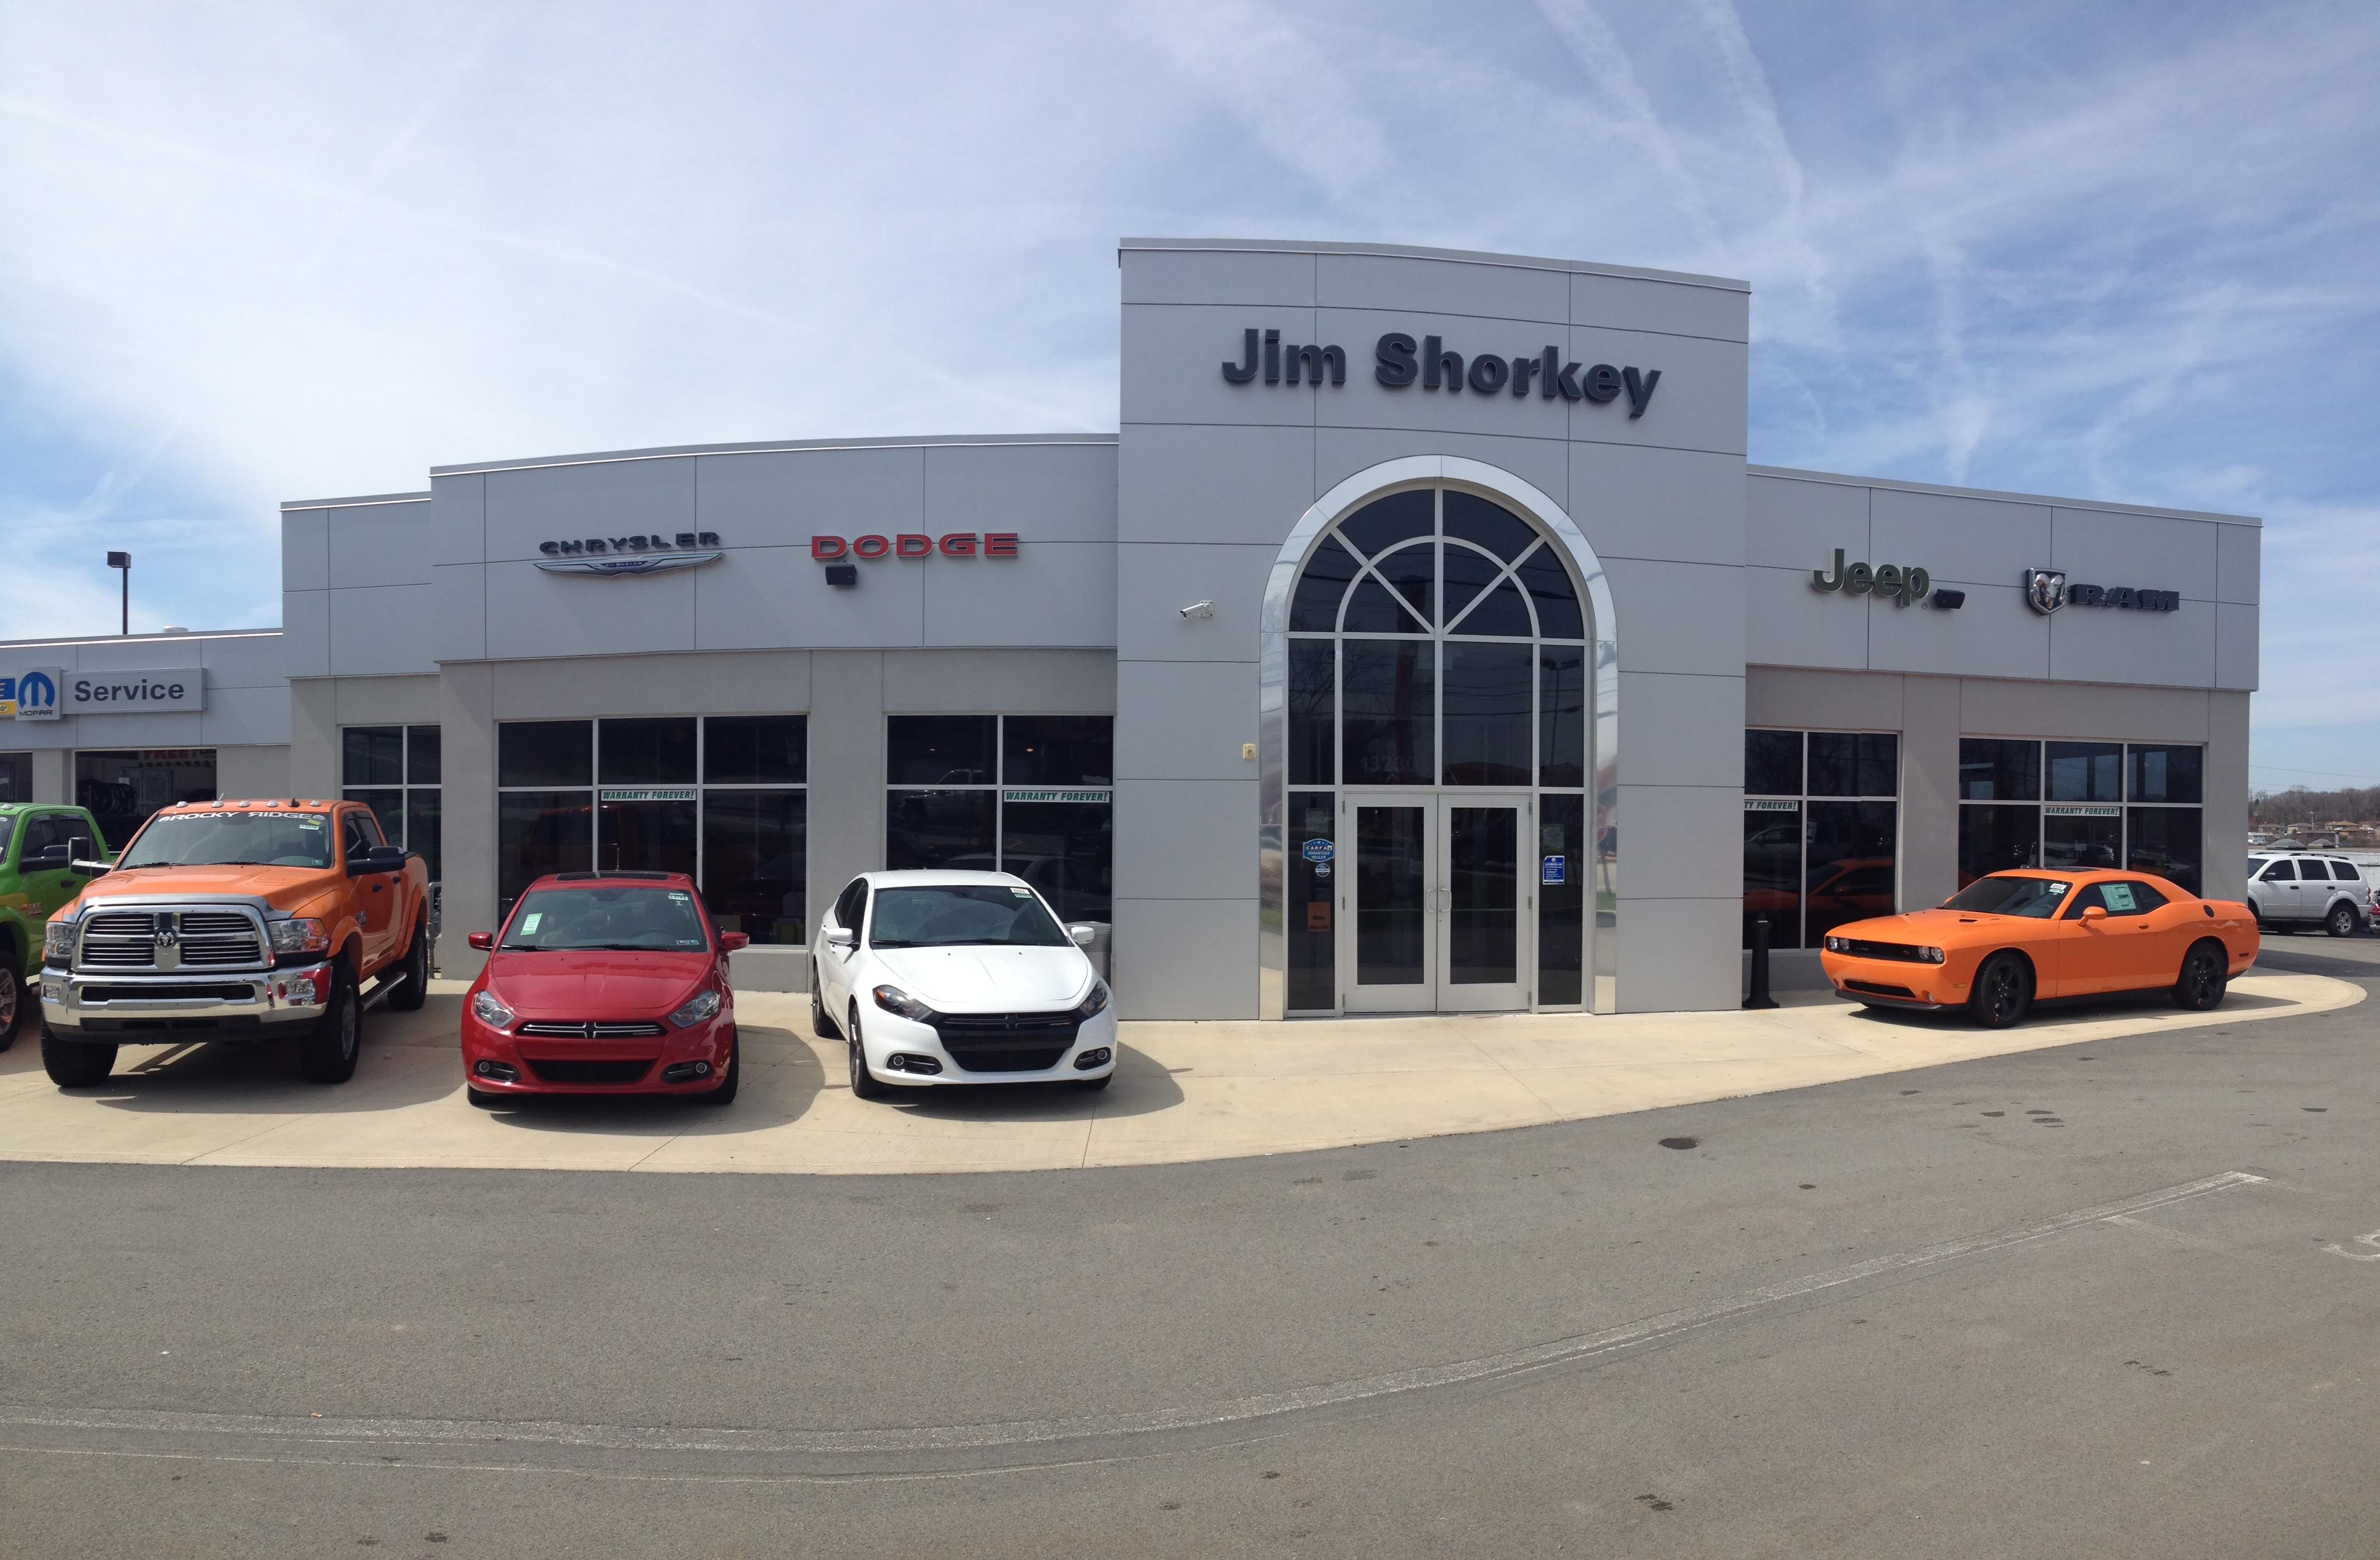 Jim Shorkey Dodge >> Jim Shorkey Chrysler Dodge Jp 13230 State Route 30, Irwin ...